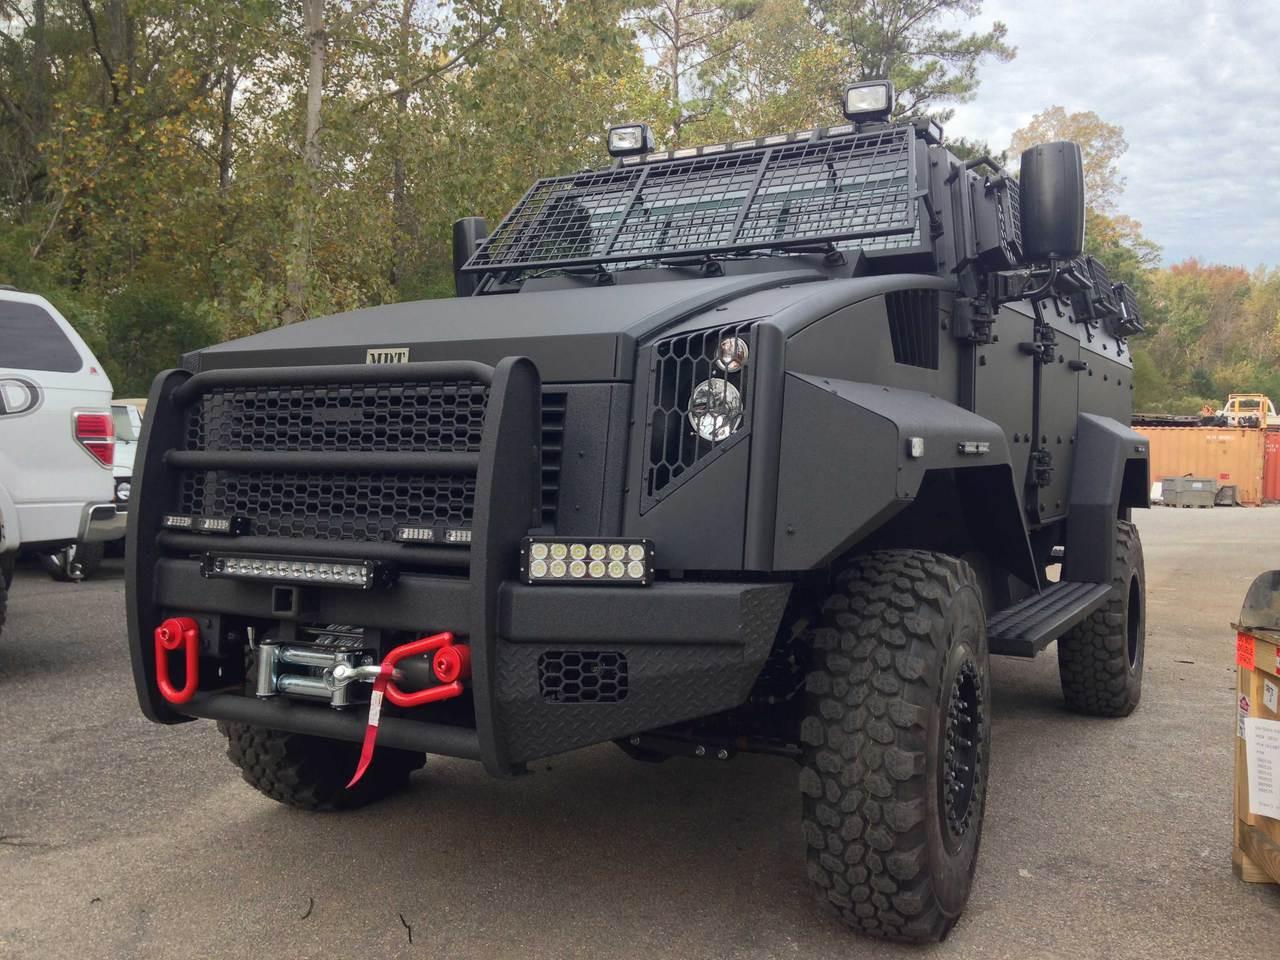 "Dual Row 11"" Southern lite LED Light Bar on Custom Bomb Proof Military Grade Vehicle"